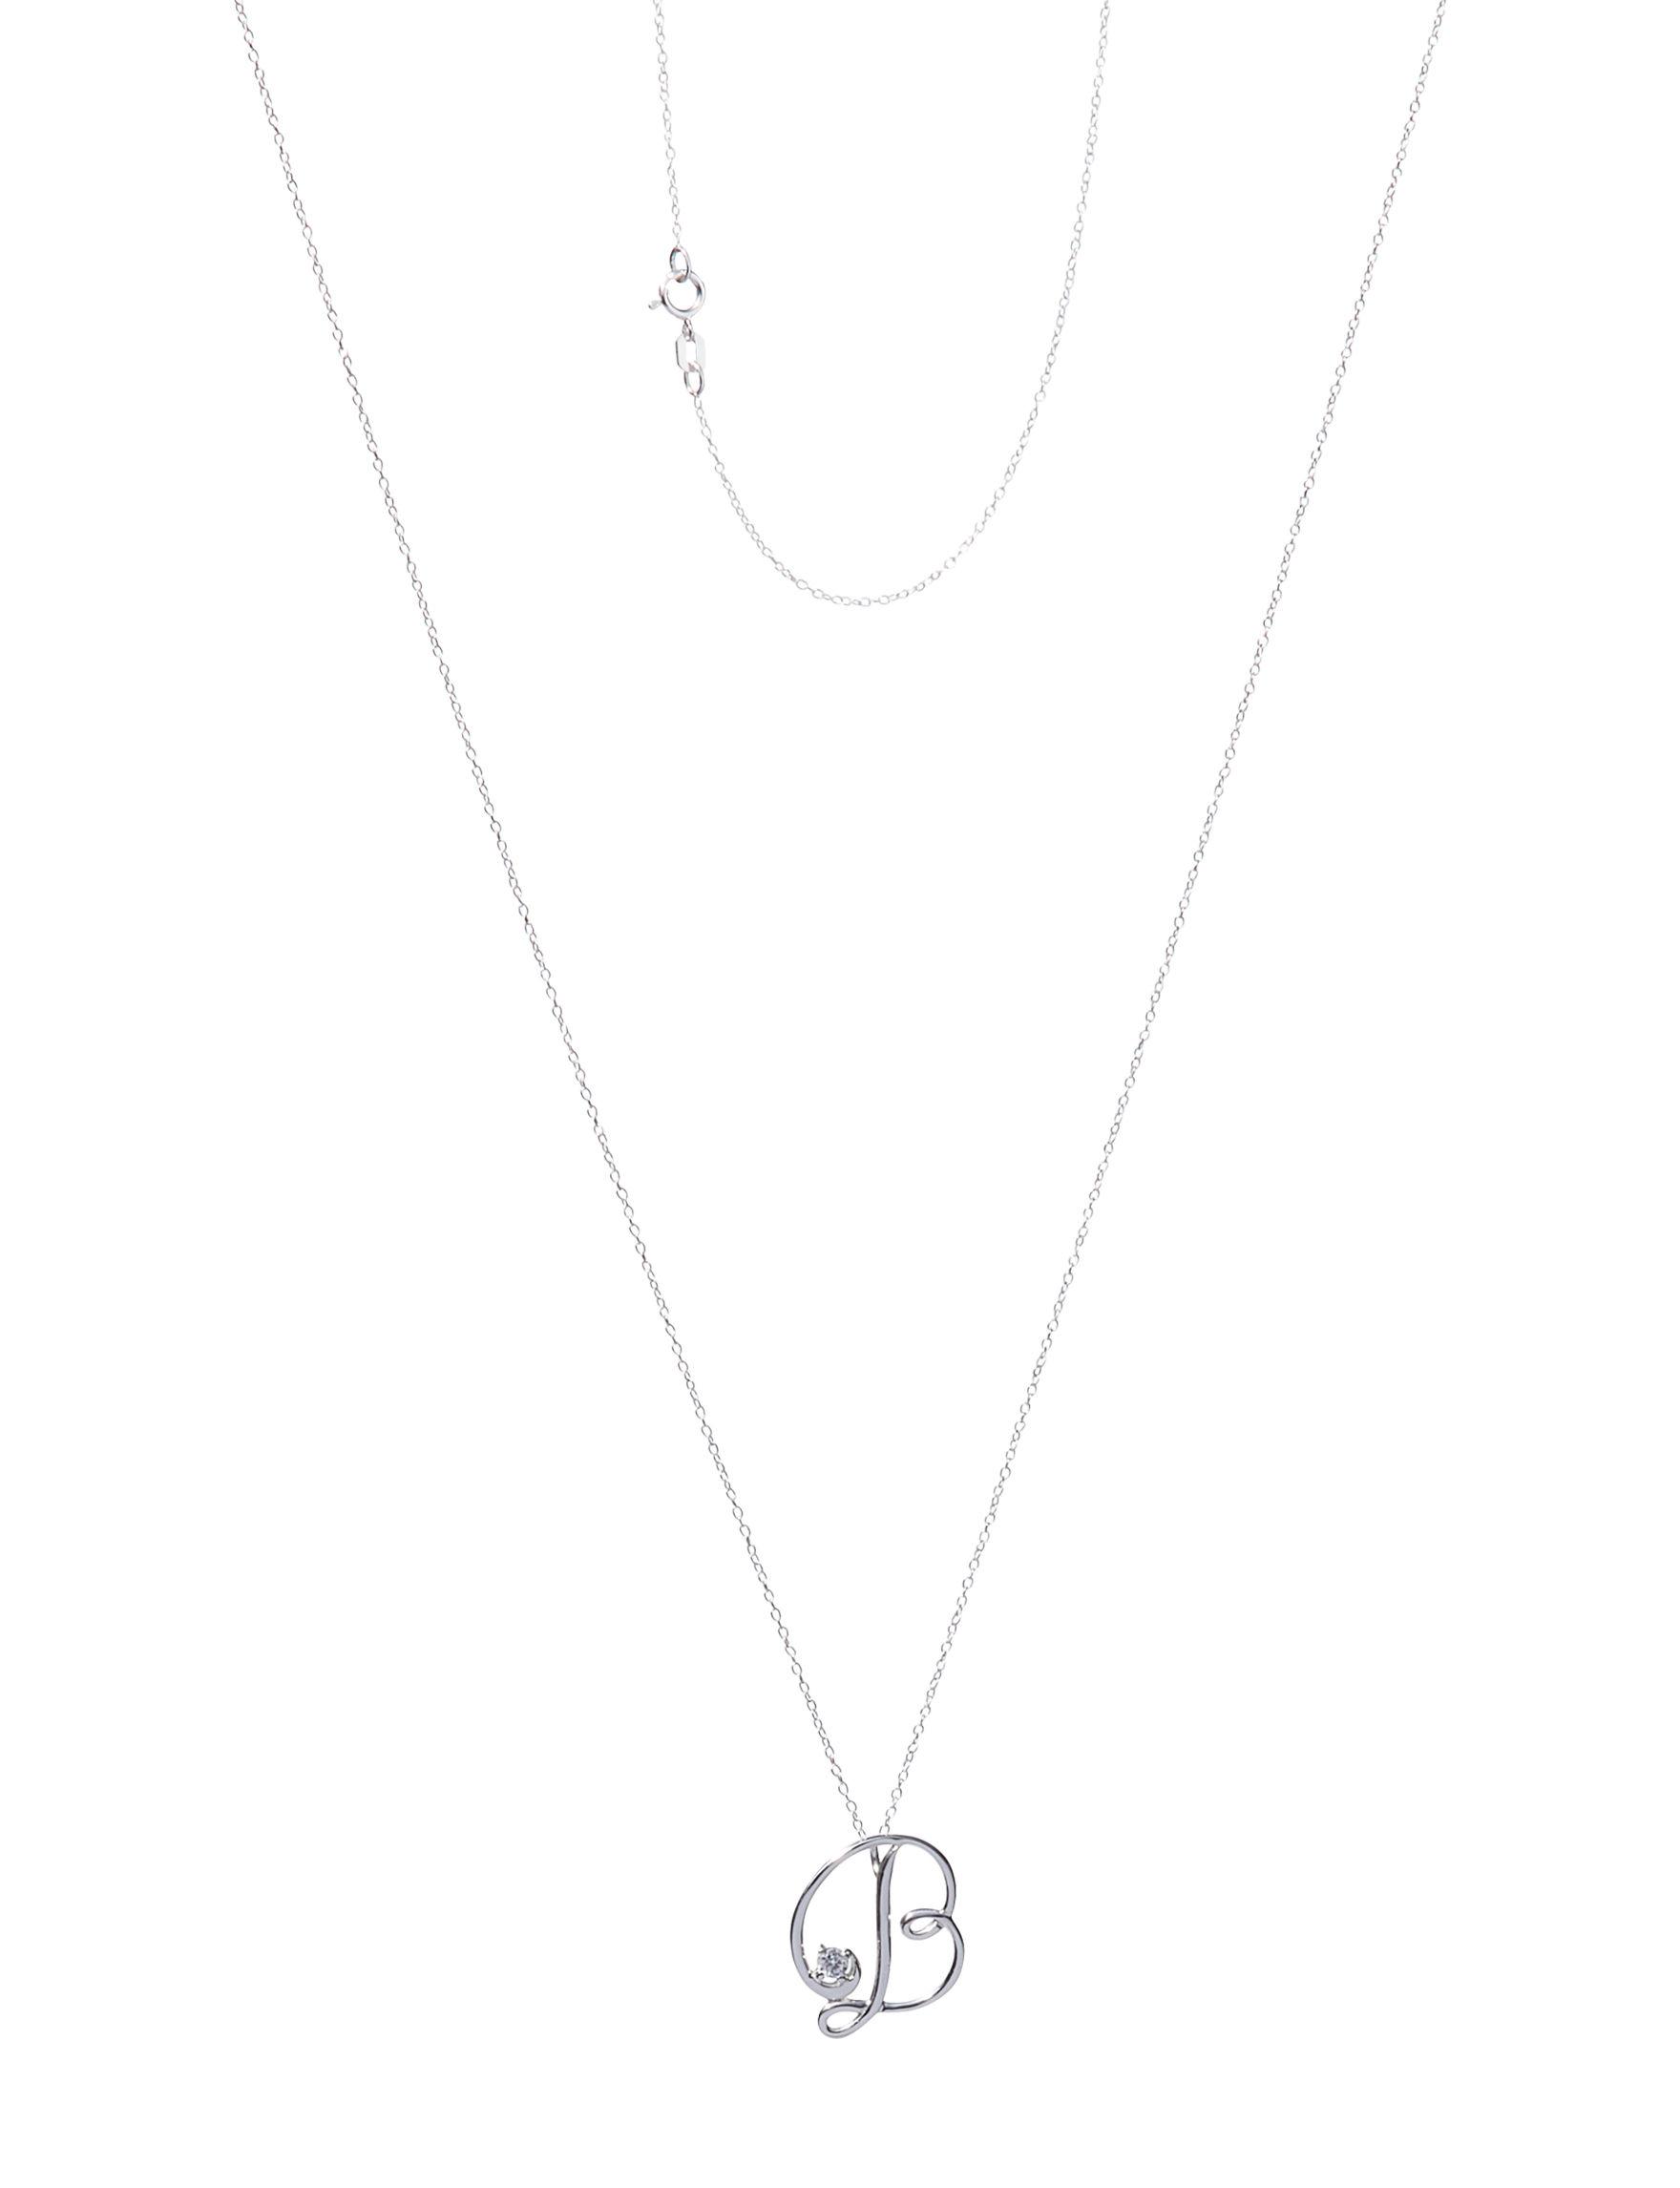 Marsala Sterling Silver Necklaces & Pendants Fine Jewelry